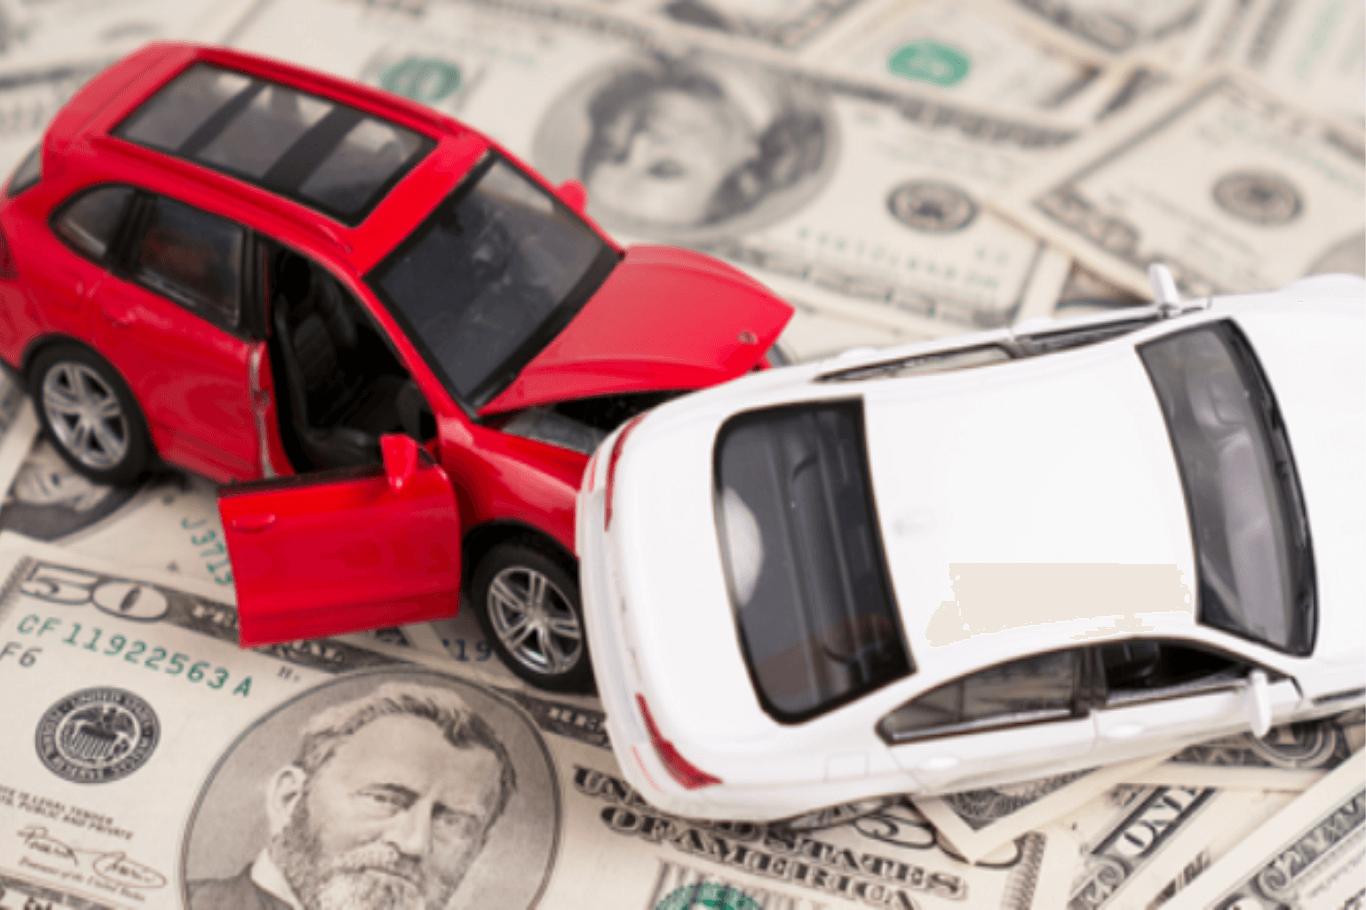 Types Of Car Insurance Fraud